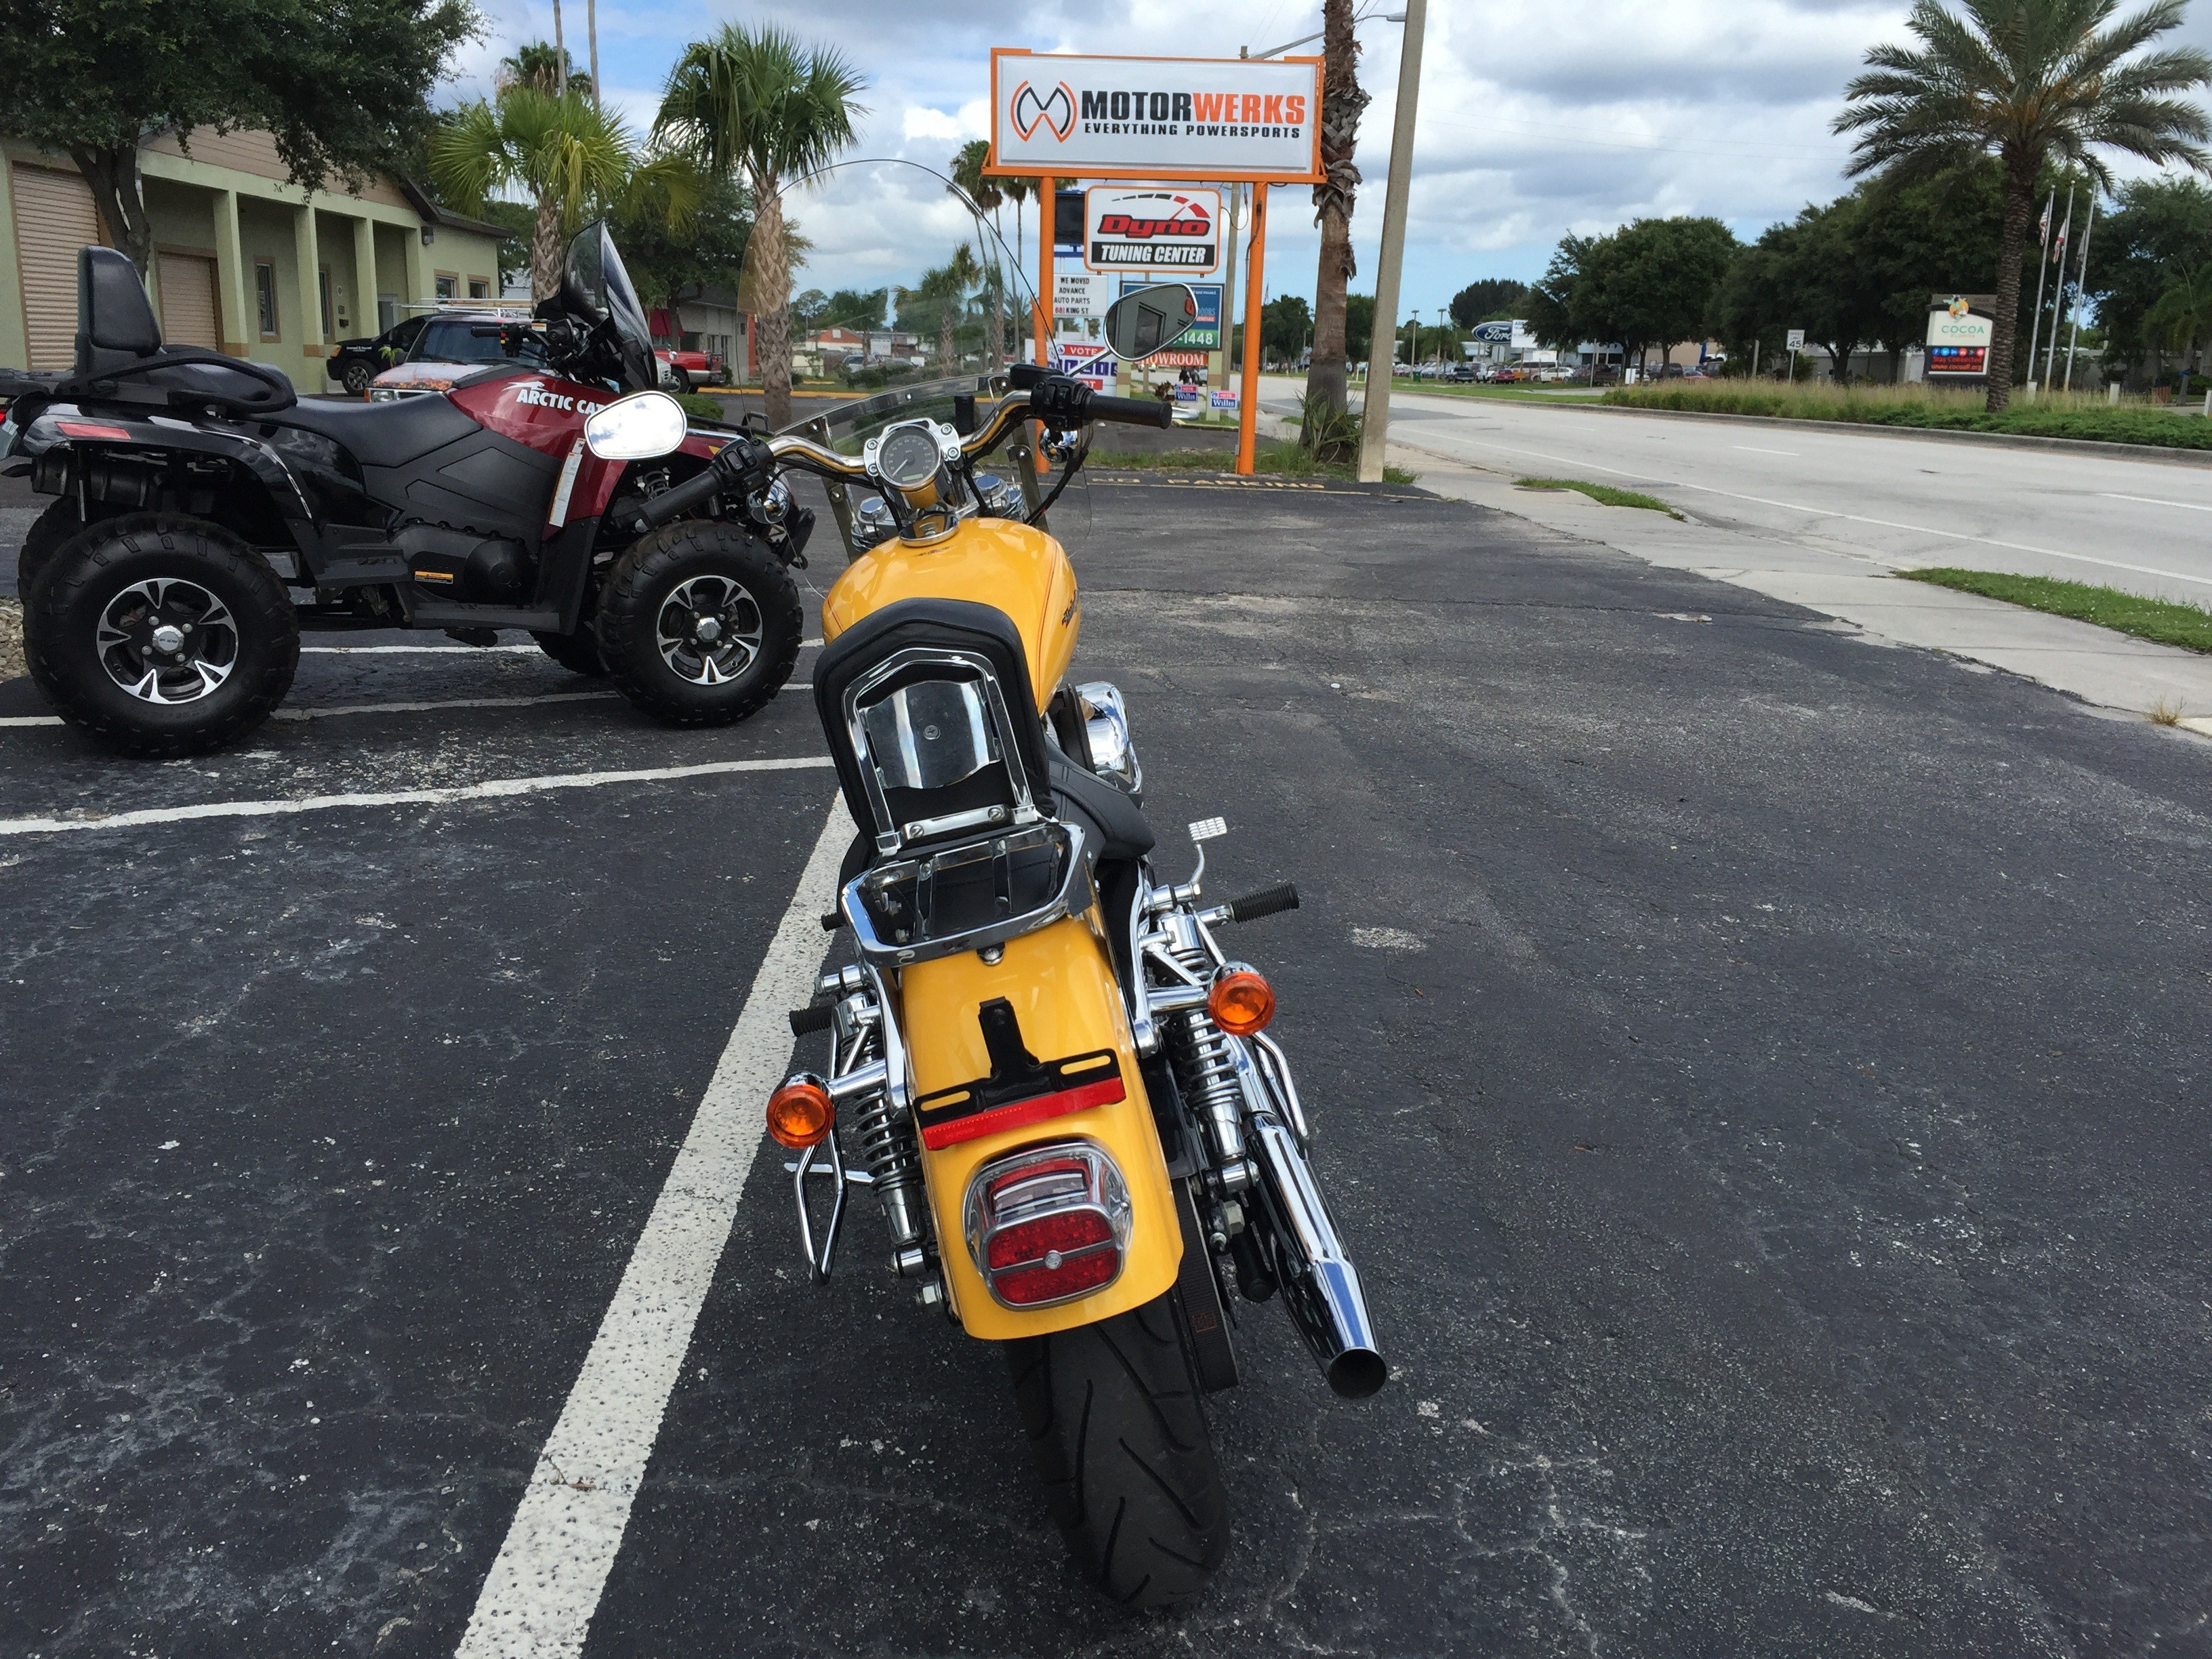 2005 harley davidson sportster xl 883c motorcycles cocoa florida 2005 harley davidson sportster xl 883c in cocoa florida sciox Gallery